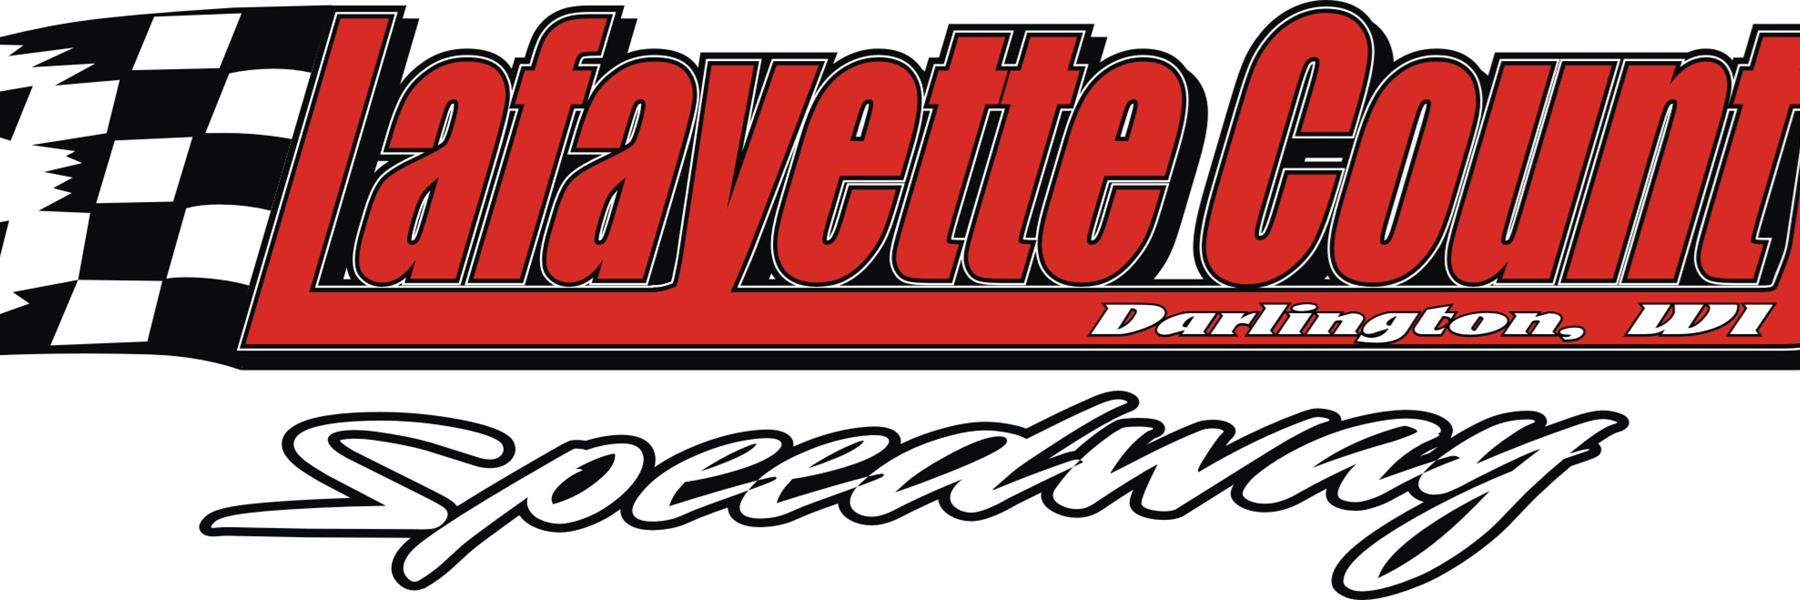 Lafayette County Speedway